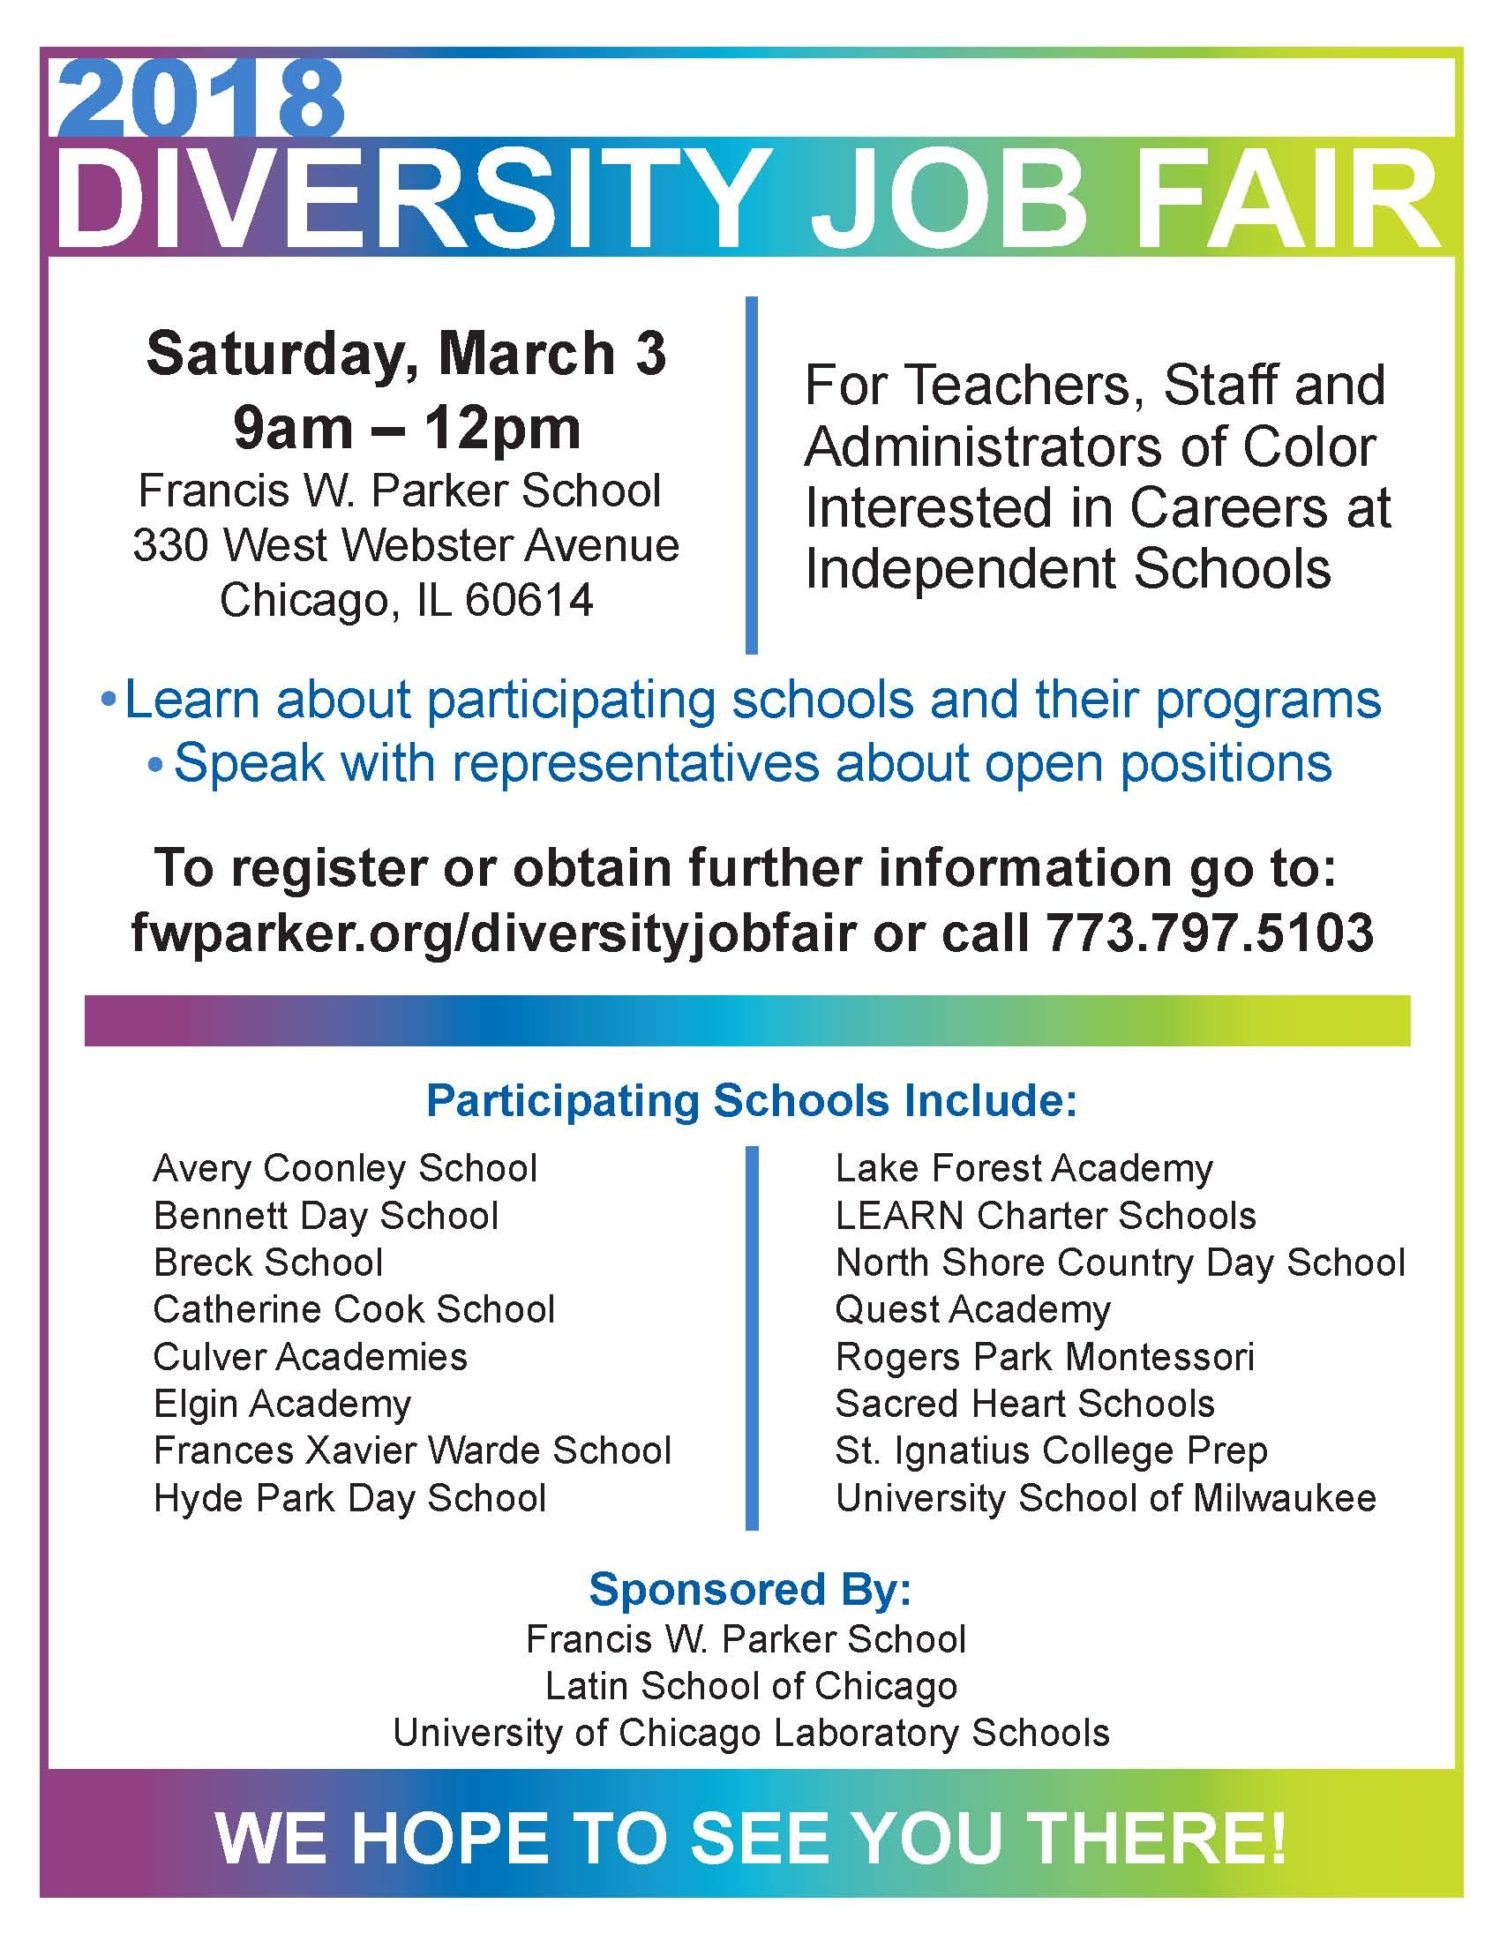 Diversity Job Fair - PEN - Progressive Education Network